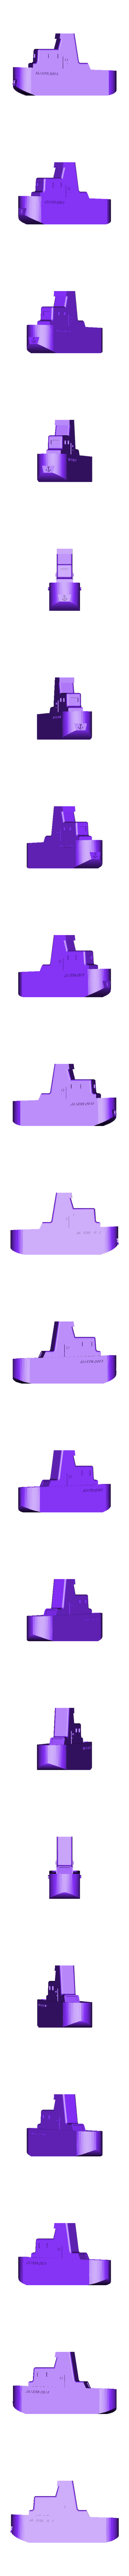 Pieza2.STL Download free STL file Maker Boat Candle Holder • 3D printer template, memoretirado